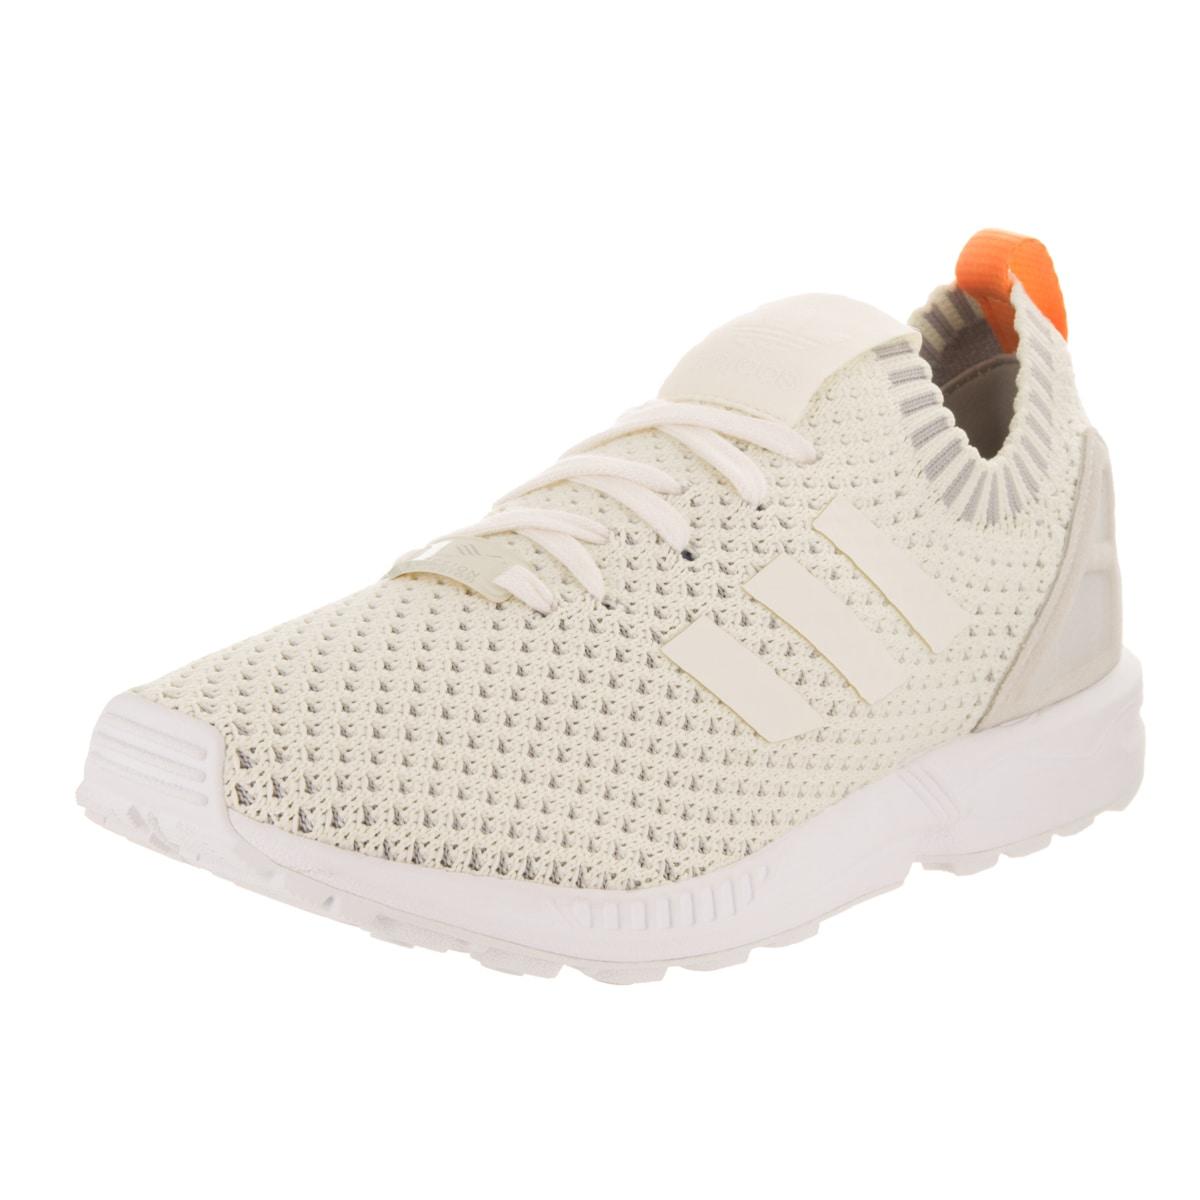 829dc0437 Shop Adidas Women s ZX Flux Pk Running Shoe - Ships To Canada -  Overstock.ca - 15858337